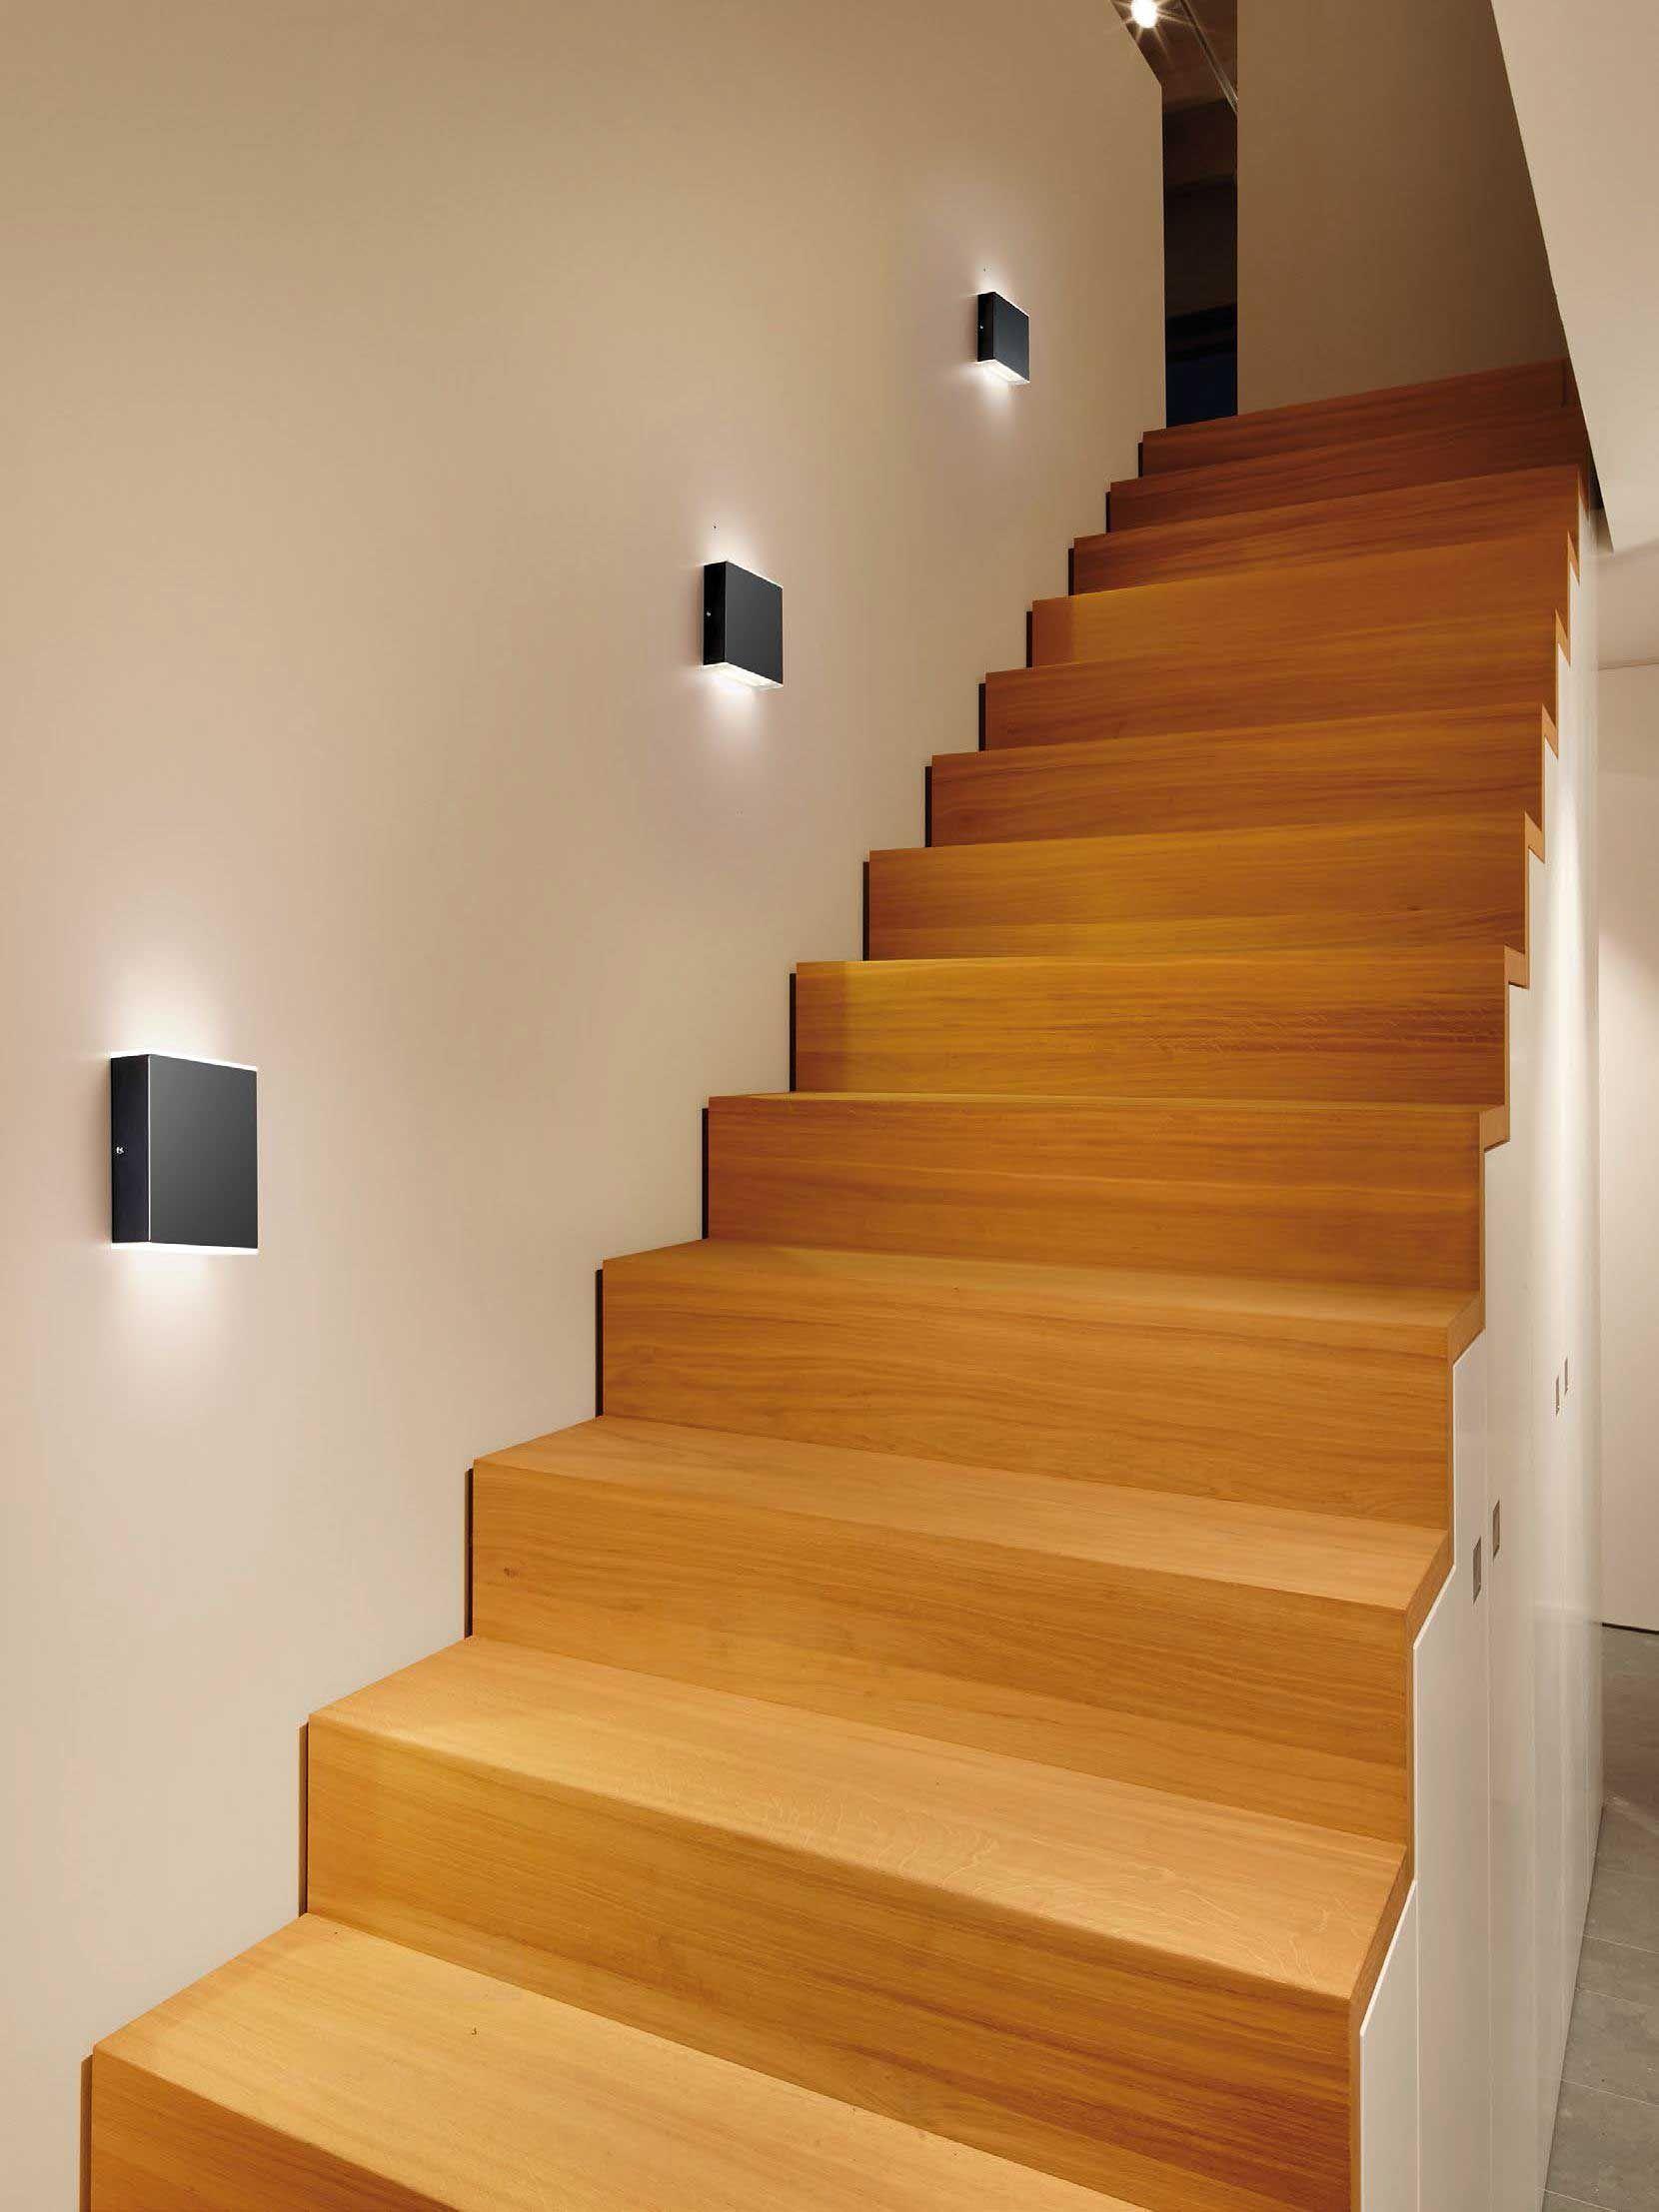 Schmidt Leuchten Led Wandleuchte Case Xl Kaufen Im Borono Online Shop Treppenhaus Beleuchtung Wandleuchte Lampen Treppenhaus